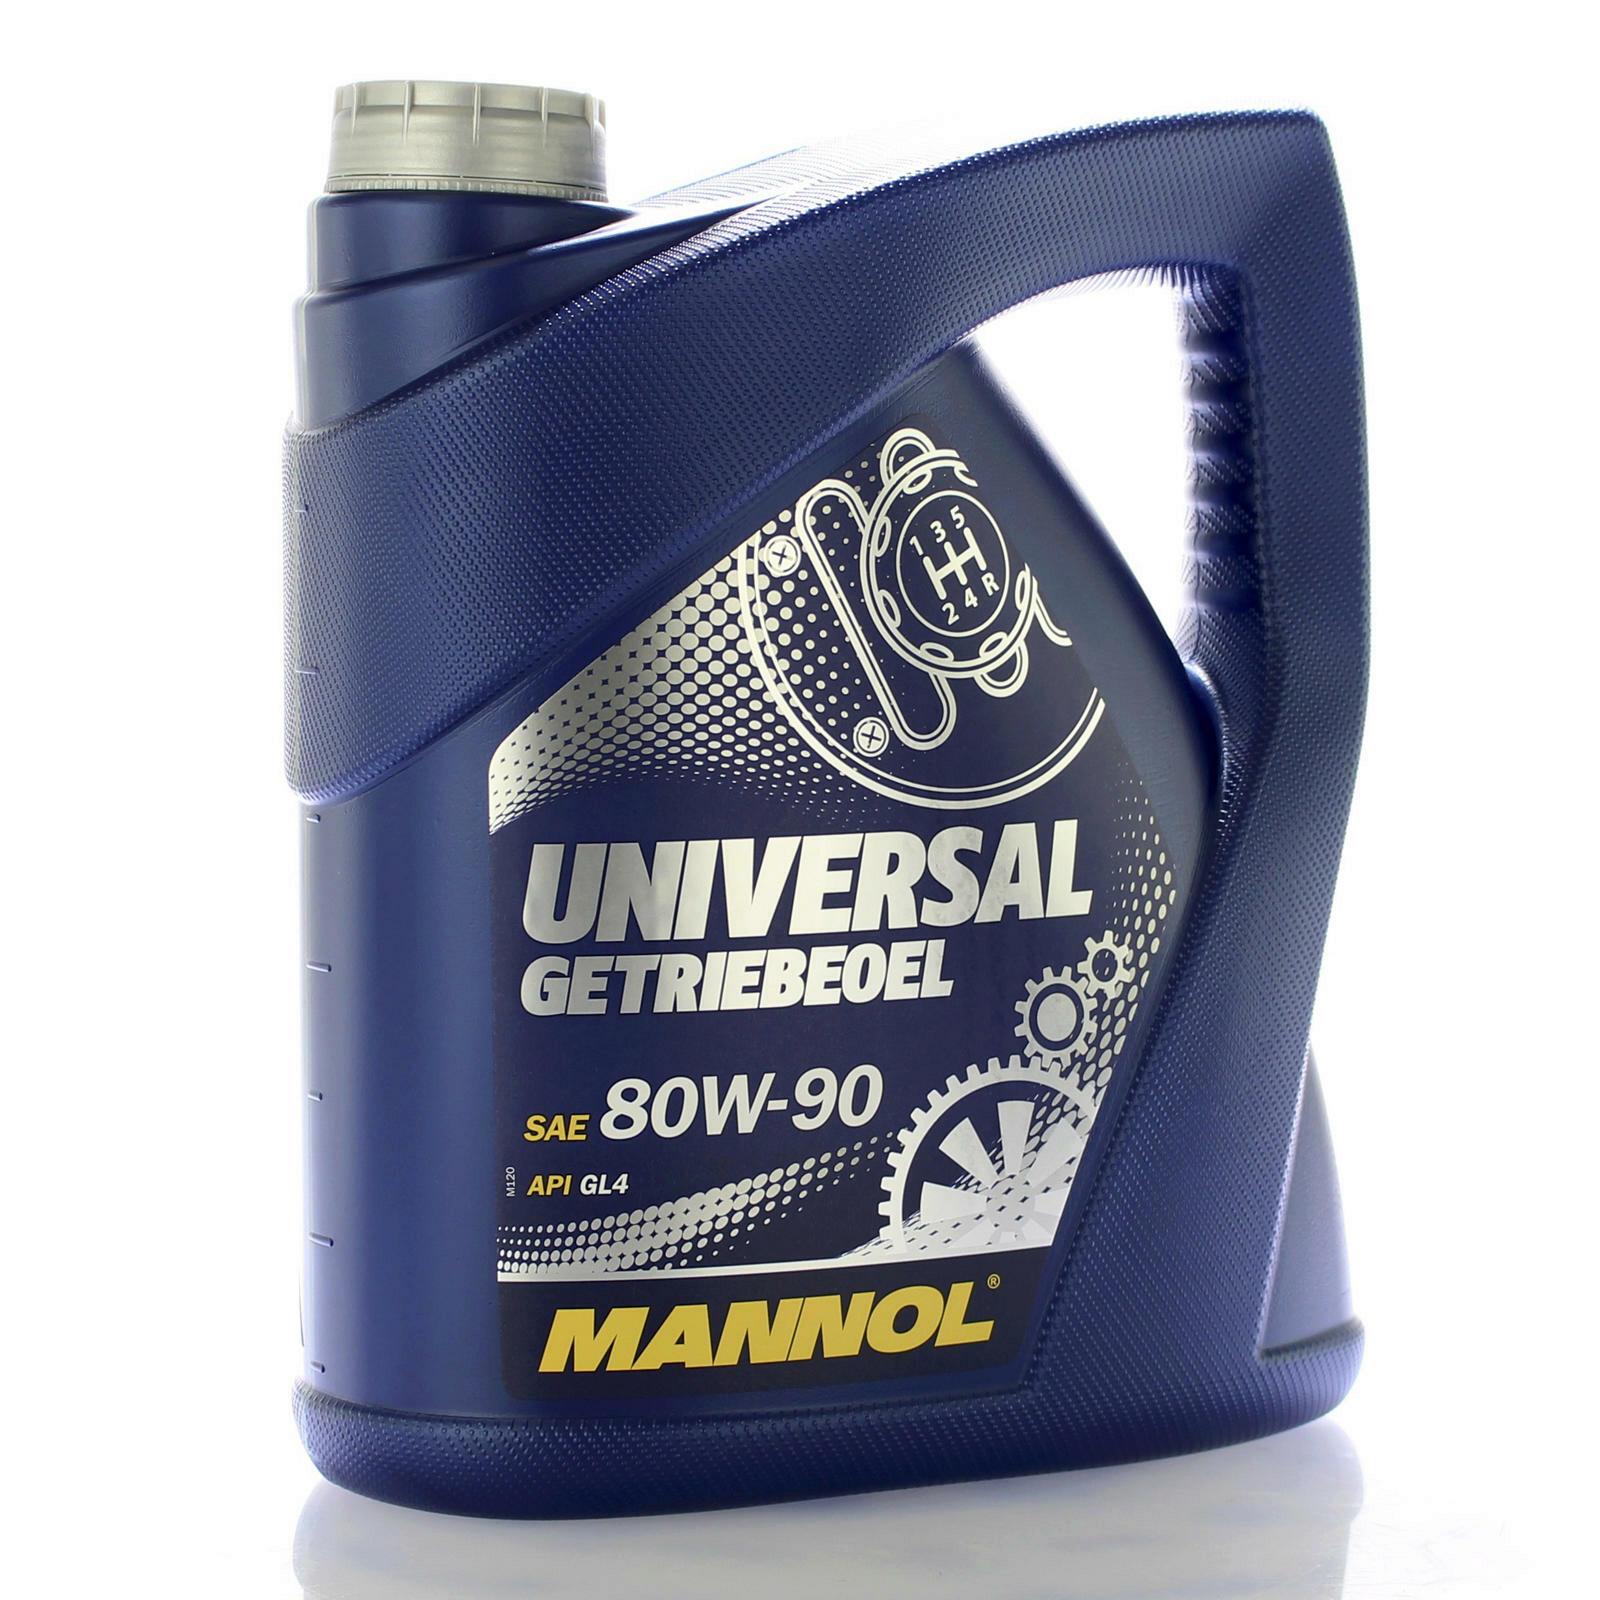 Mannol Universal Getriebeöl 4L